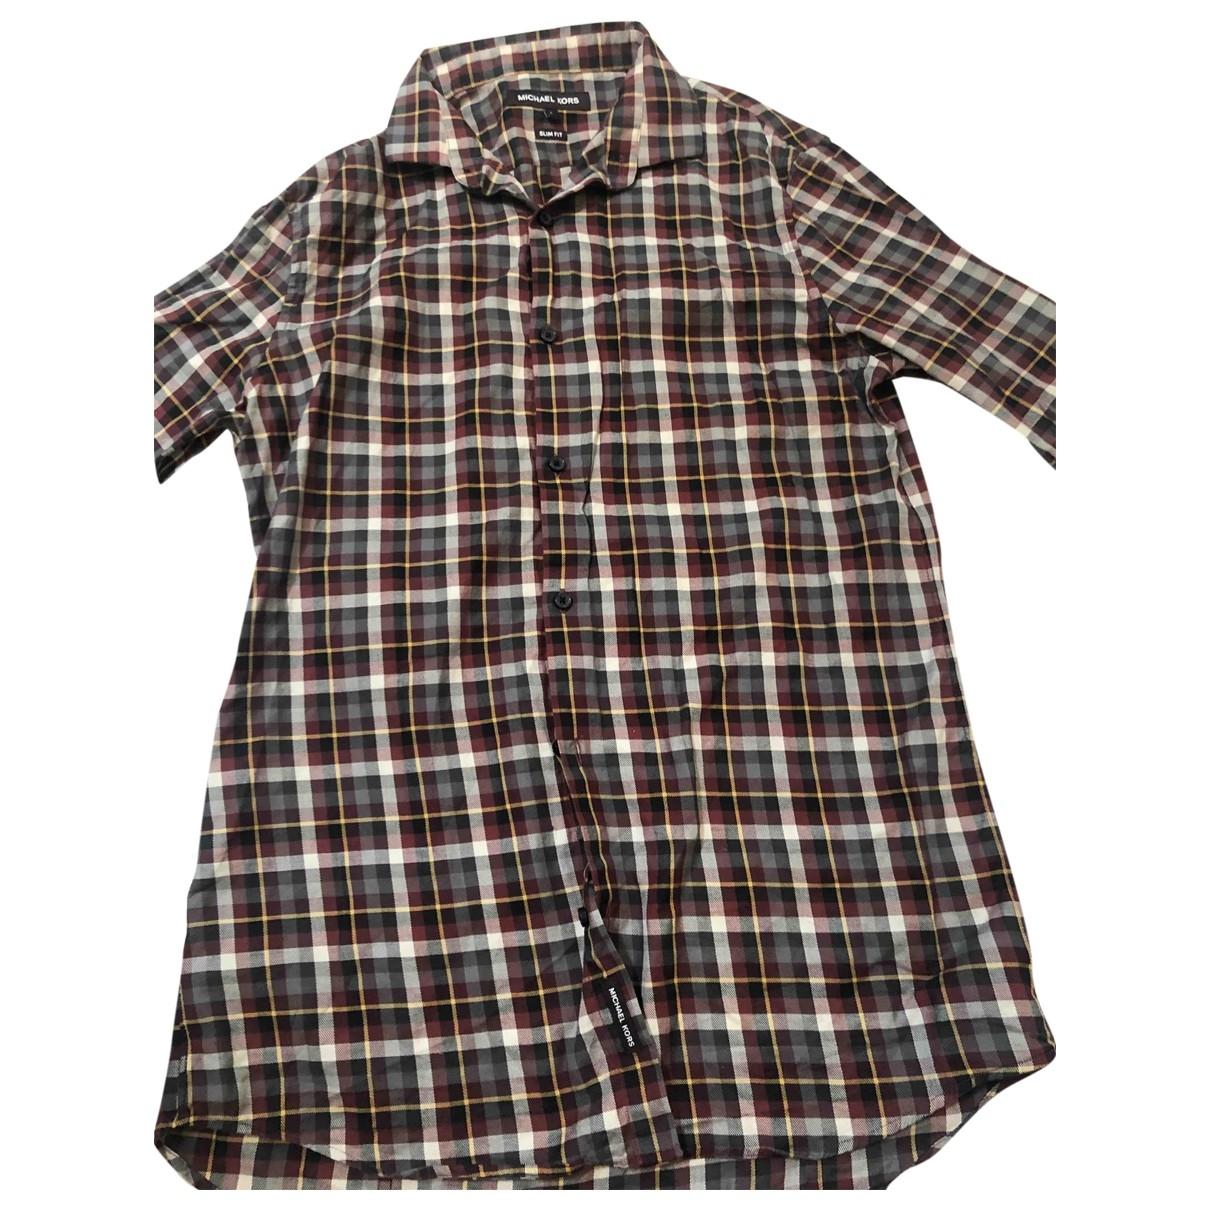 Michael Kors \N Multicolour Cotton Shirts for Men S International